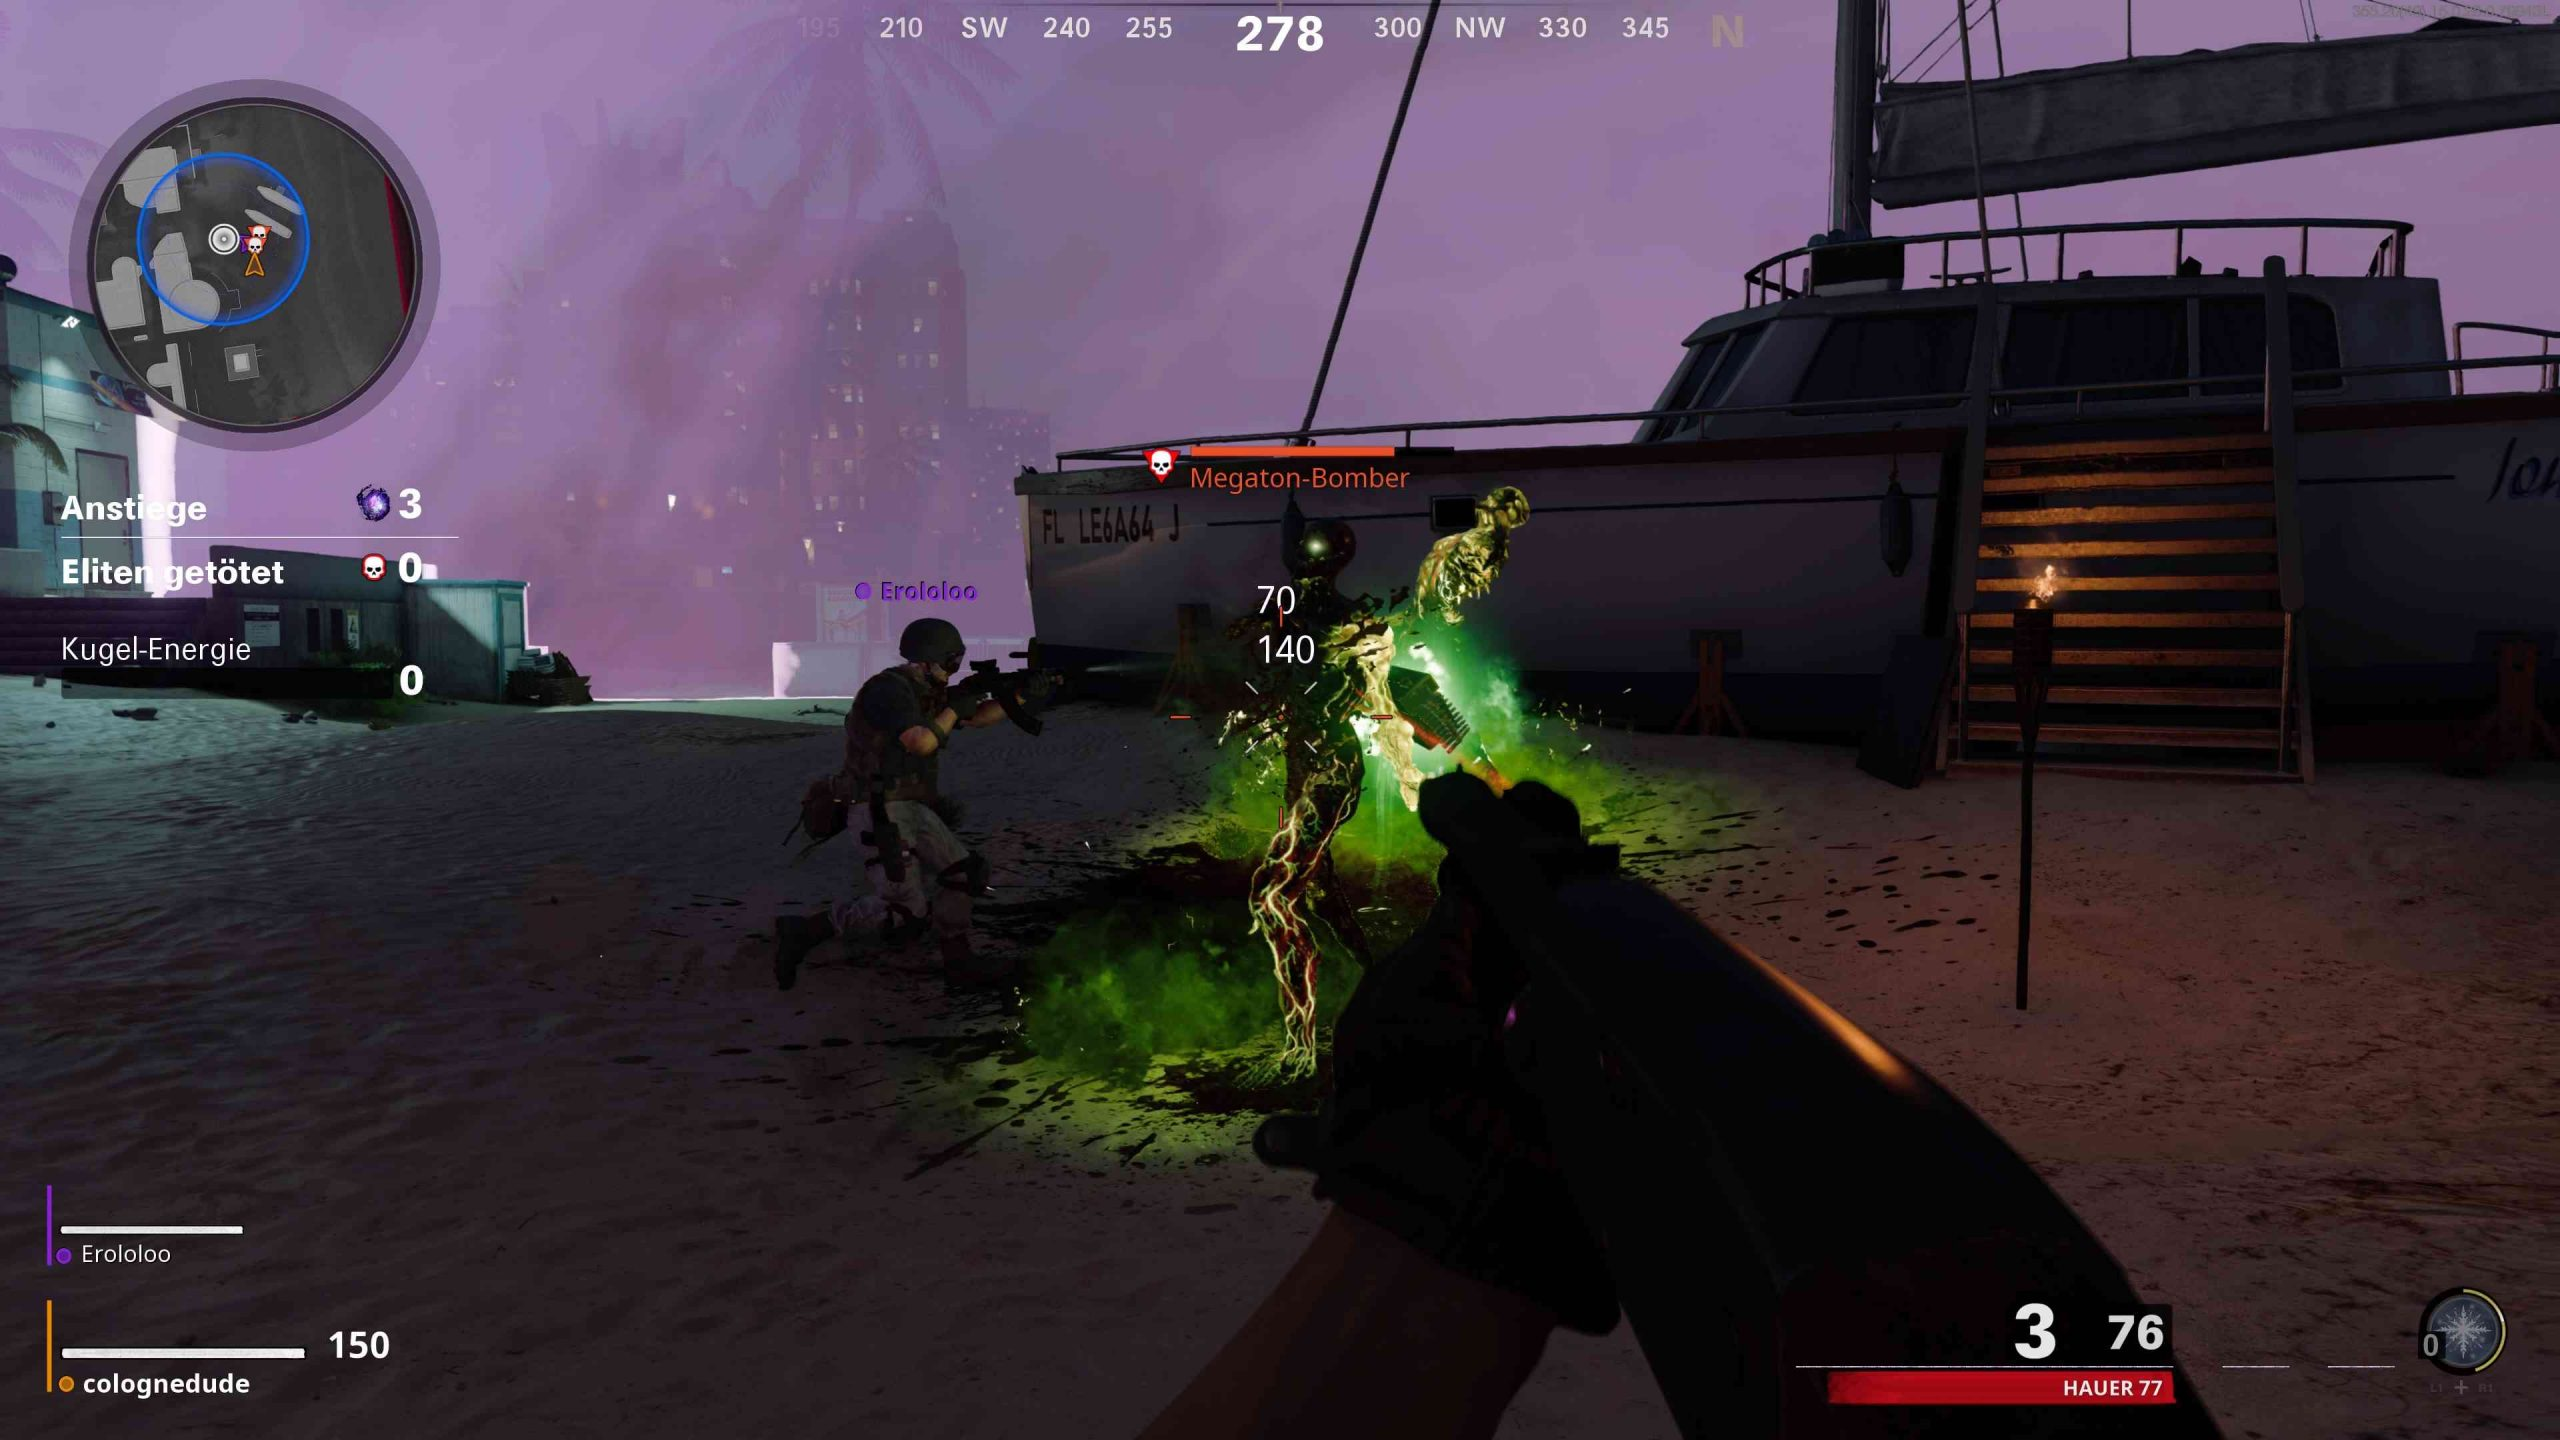 CoD Black Ops Cold War – Bild 4